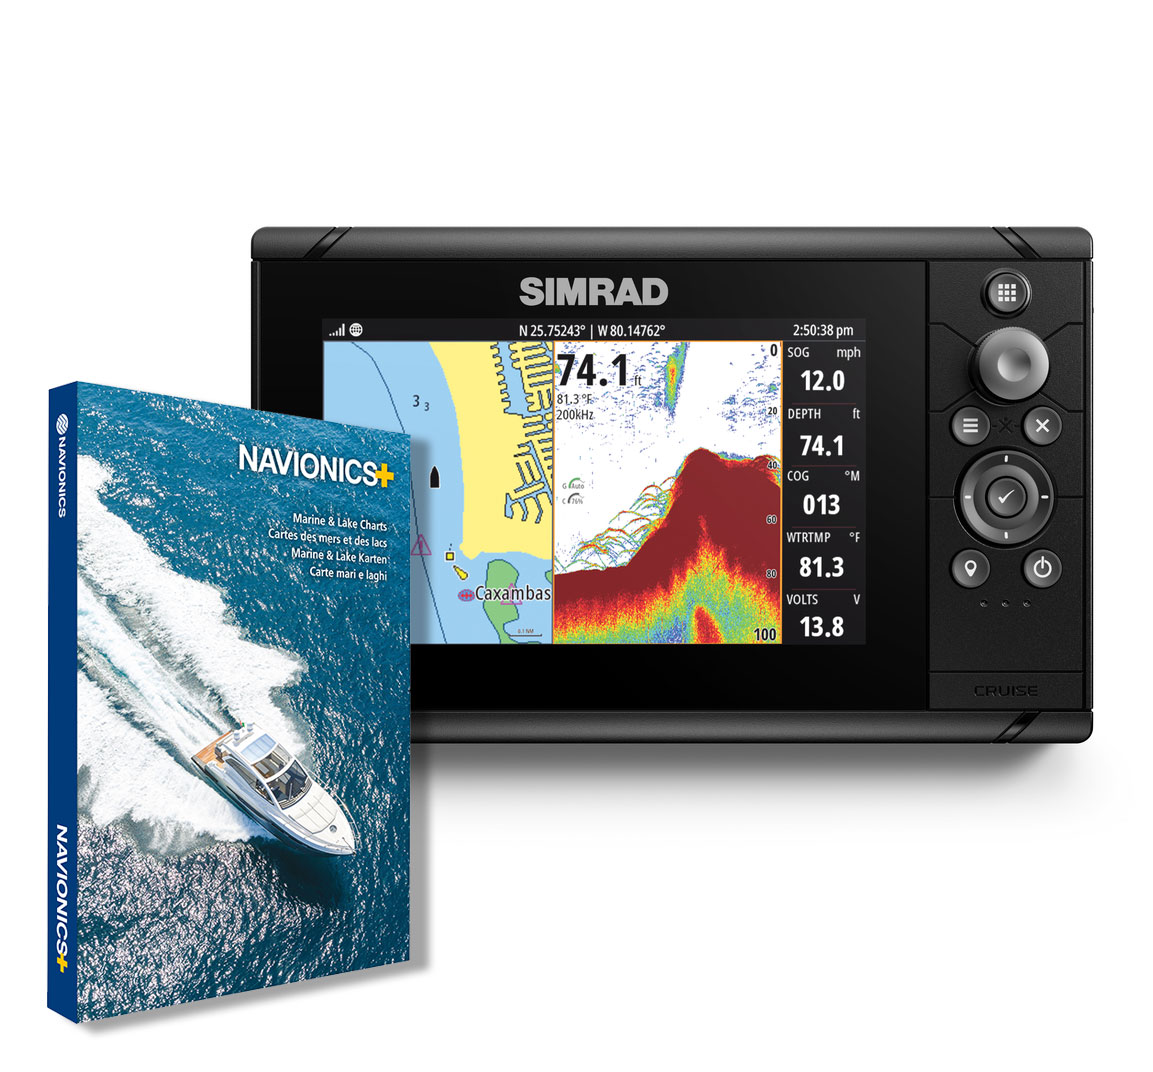 Simrad Cruise 7 GPS Kartenplotter Echolot mit Navionics Seekarte